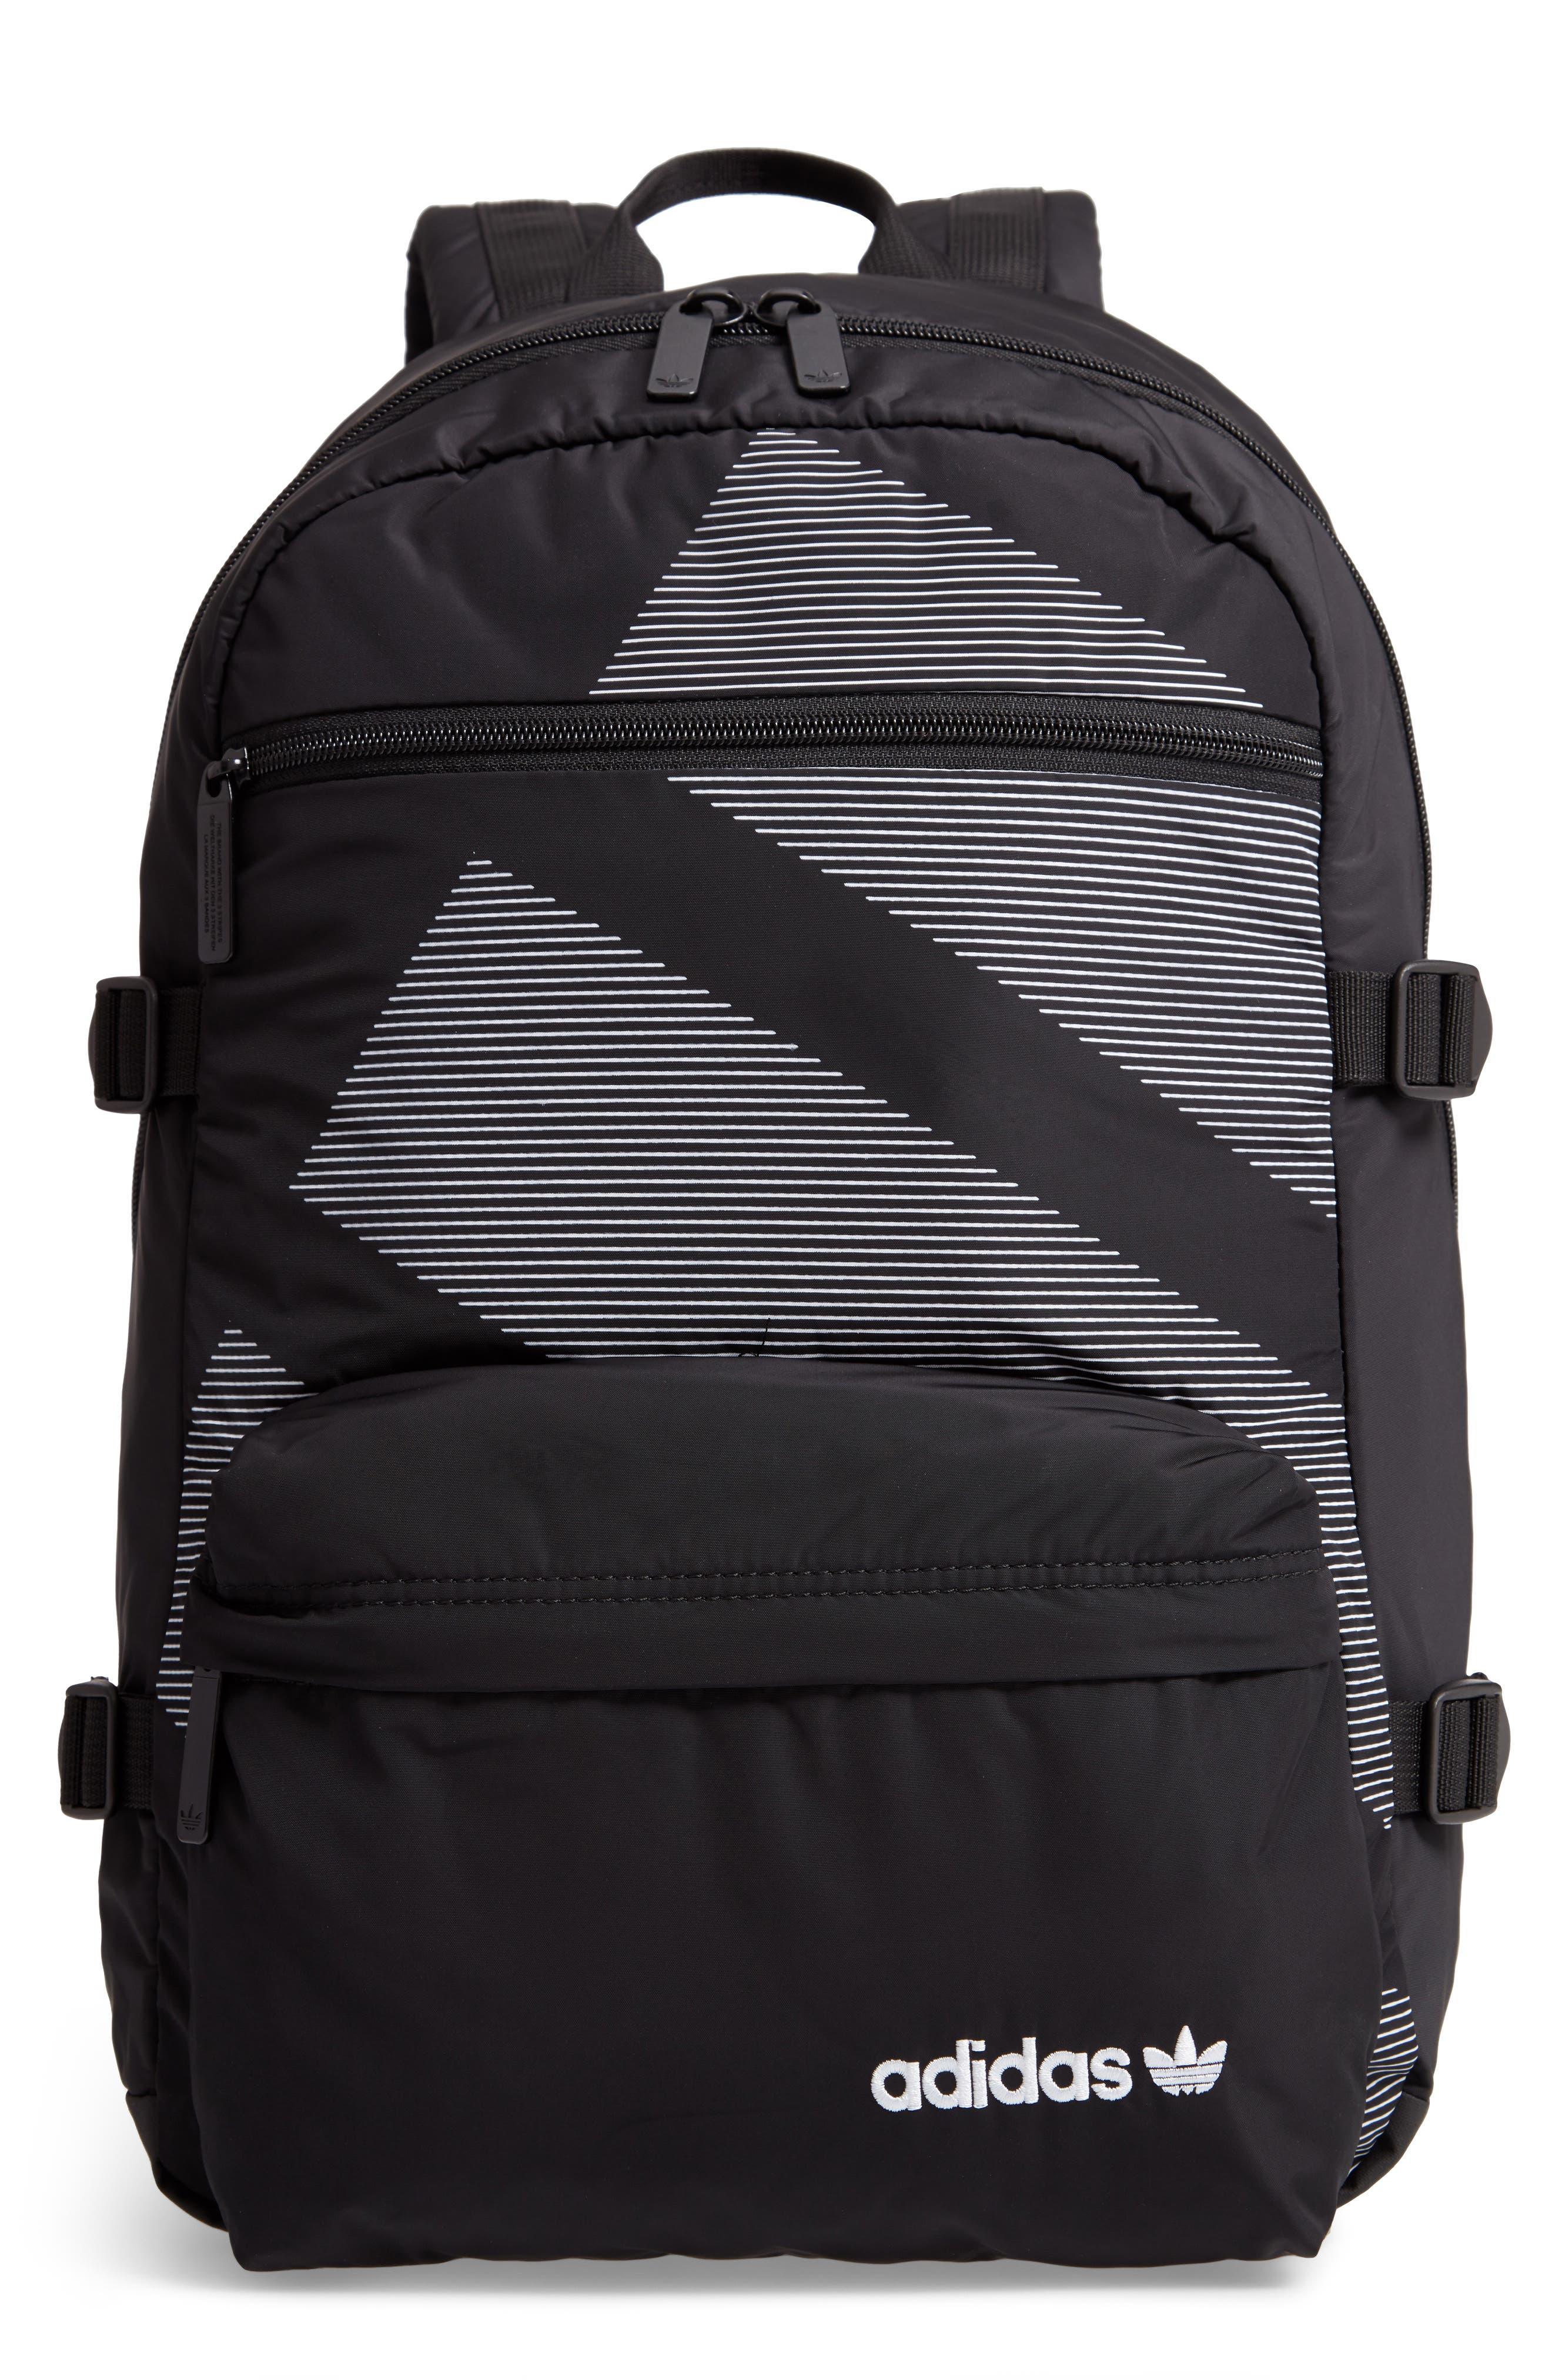 ADIDAS ORIGINALS EQT Backpack, Main, color, BLACK/ WHITE/ SUB GREEN